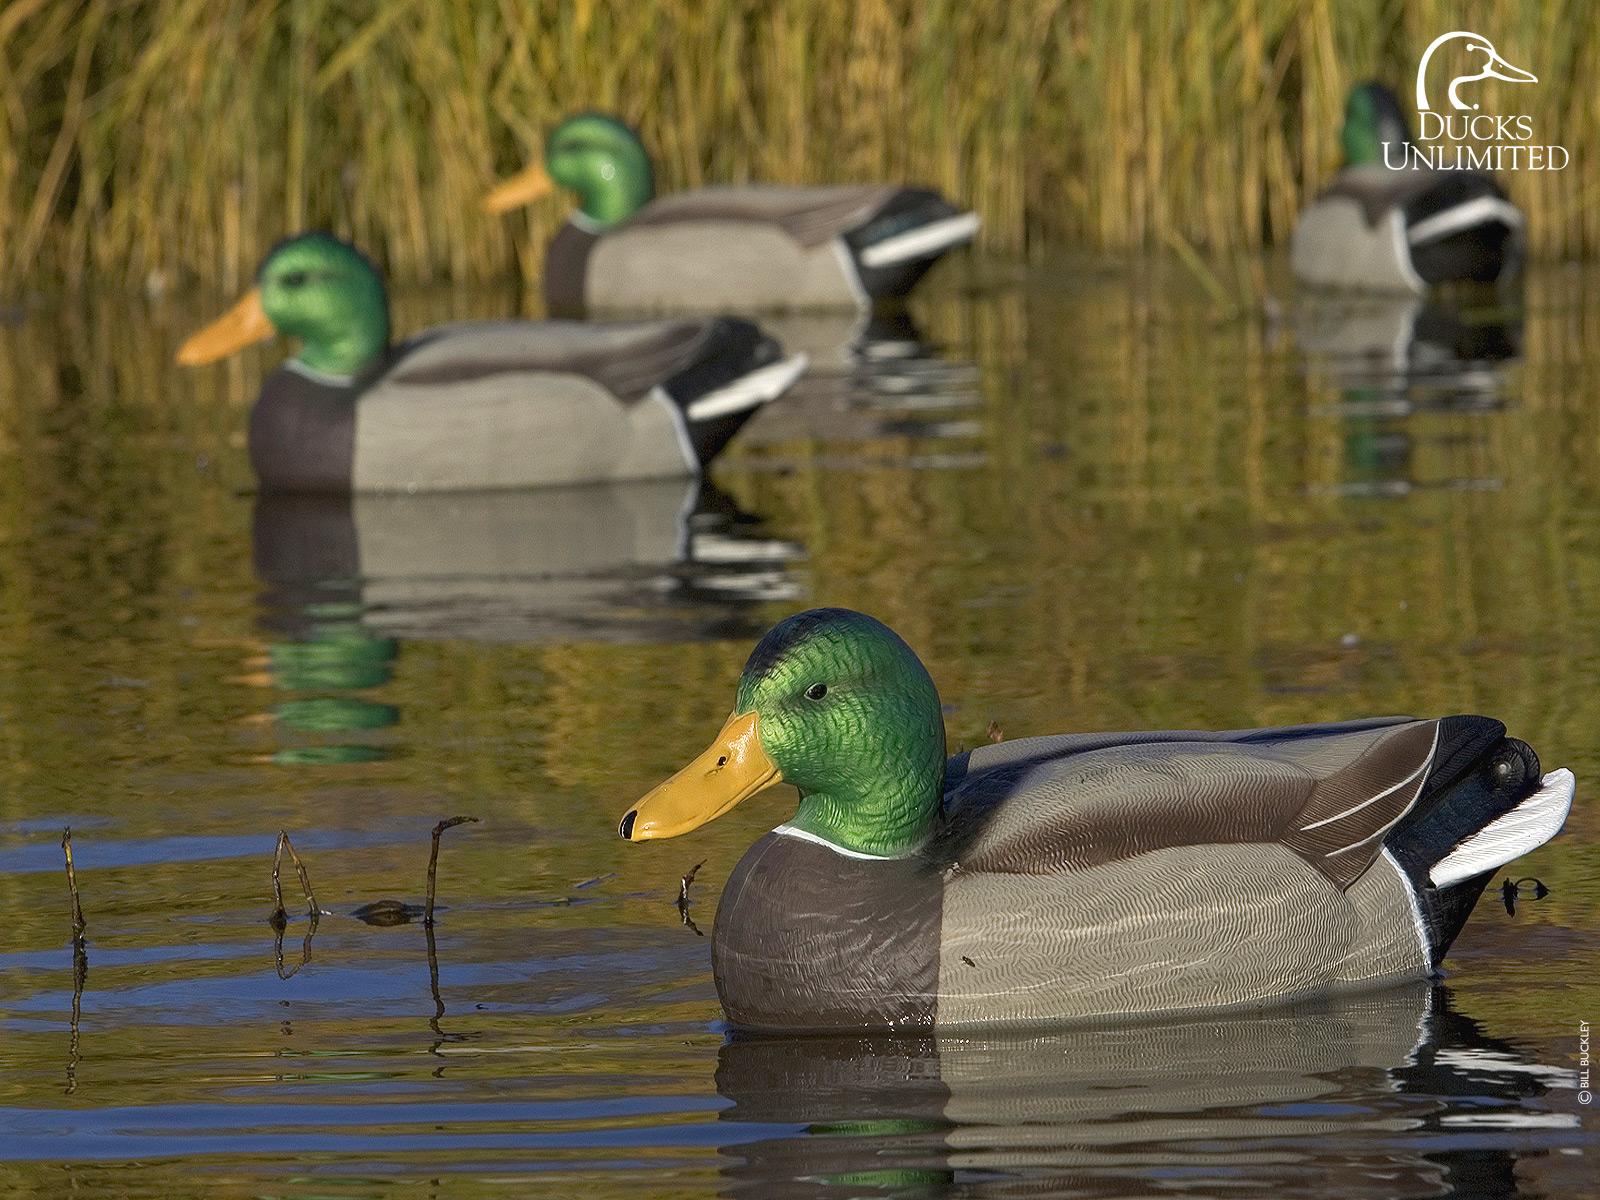 Ducks Hunted 4k Screensaver - HD Wallpaper